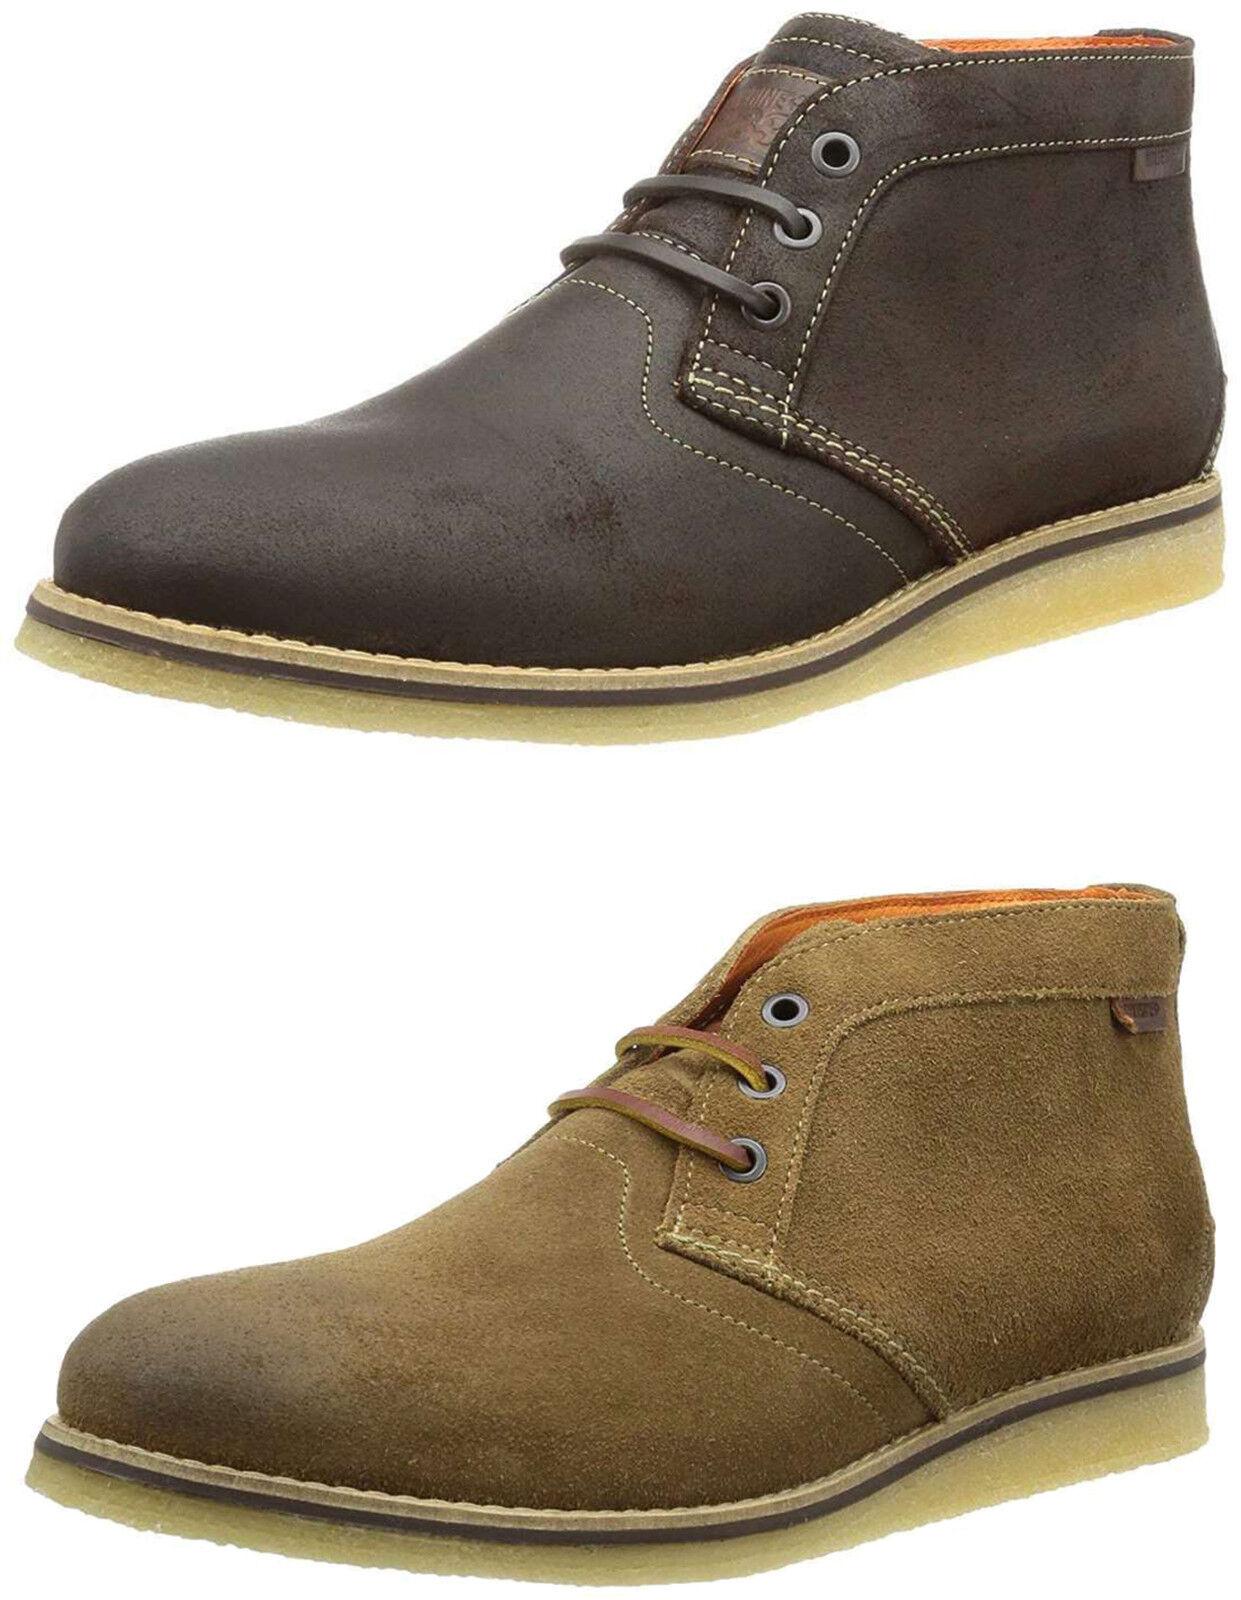 b9d0ddf385f Wolverine Men's Julian Plain Chukka Handmade Leather Winter Boots